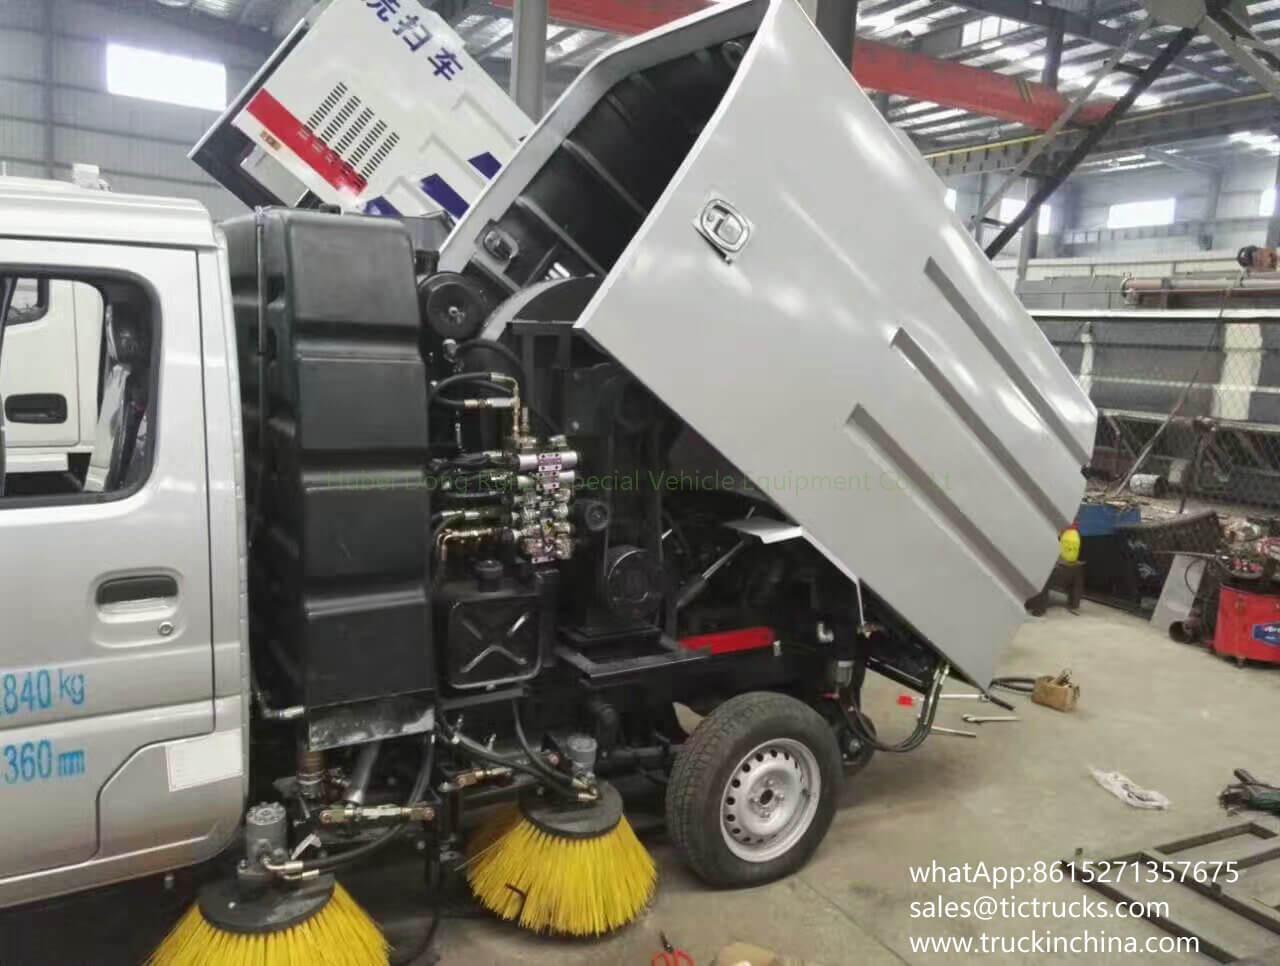 Mini balayeuse de route de la balayeuse vehicle-04T- de Changan trucks_1